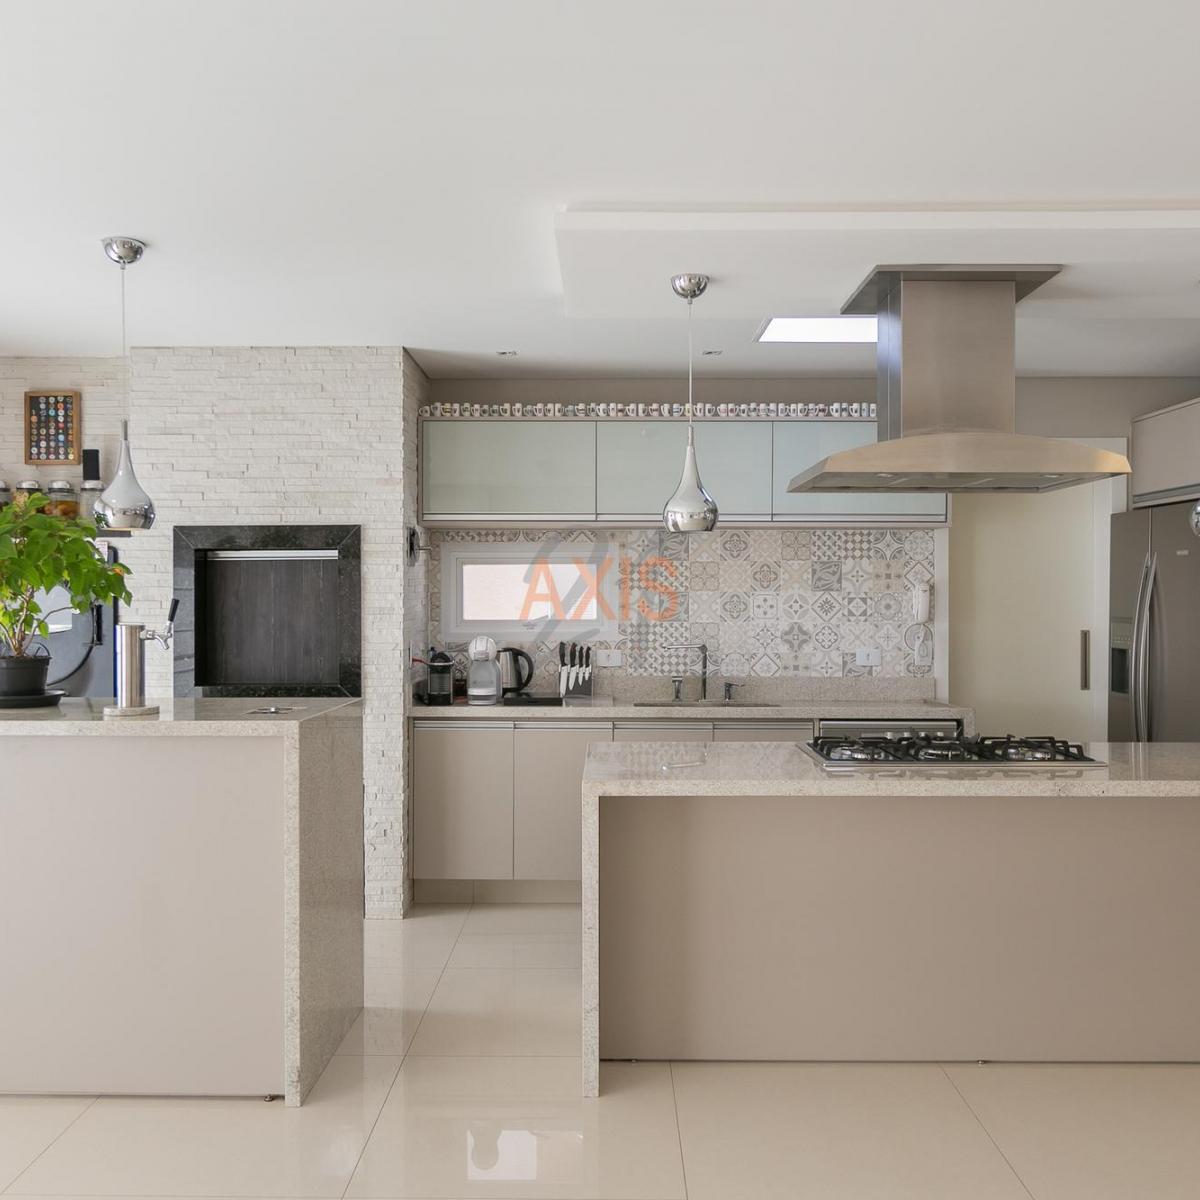 http://www.infocenterhost2.com.br/crm/fotosimovel/214919/65828657-casa-em-condominio-curitiba-pilarzinho_marcadagua.jpg